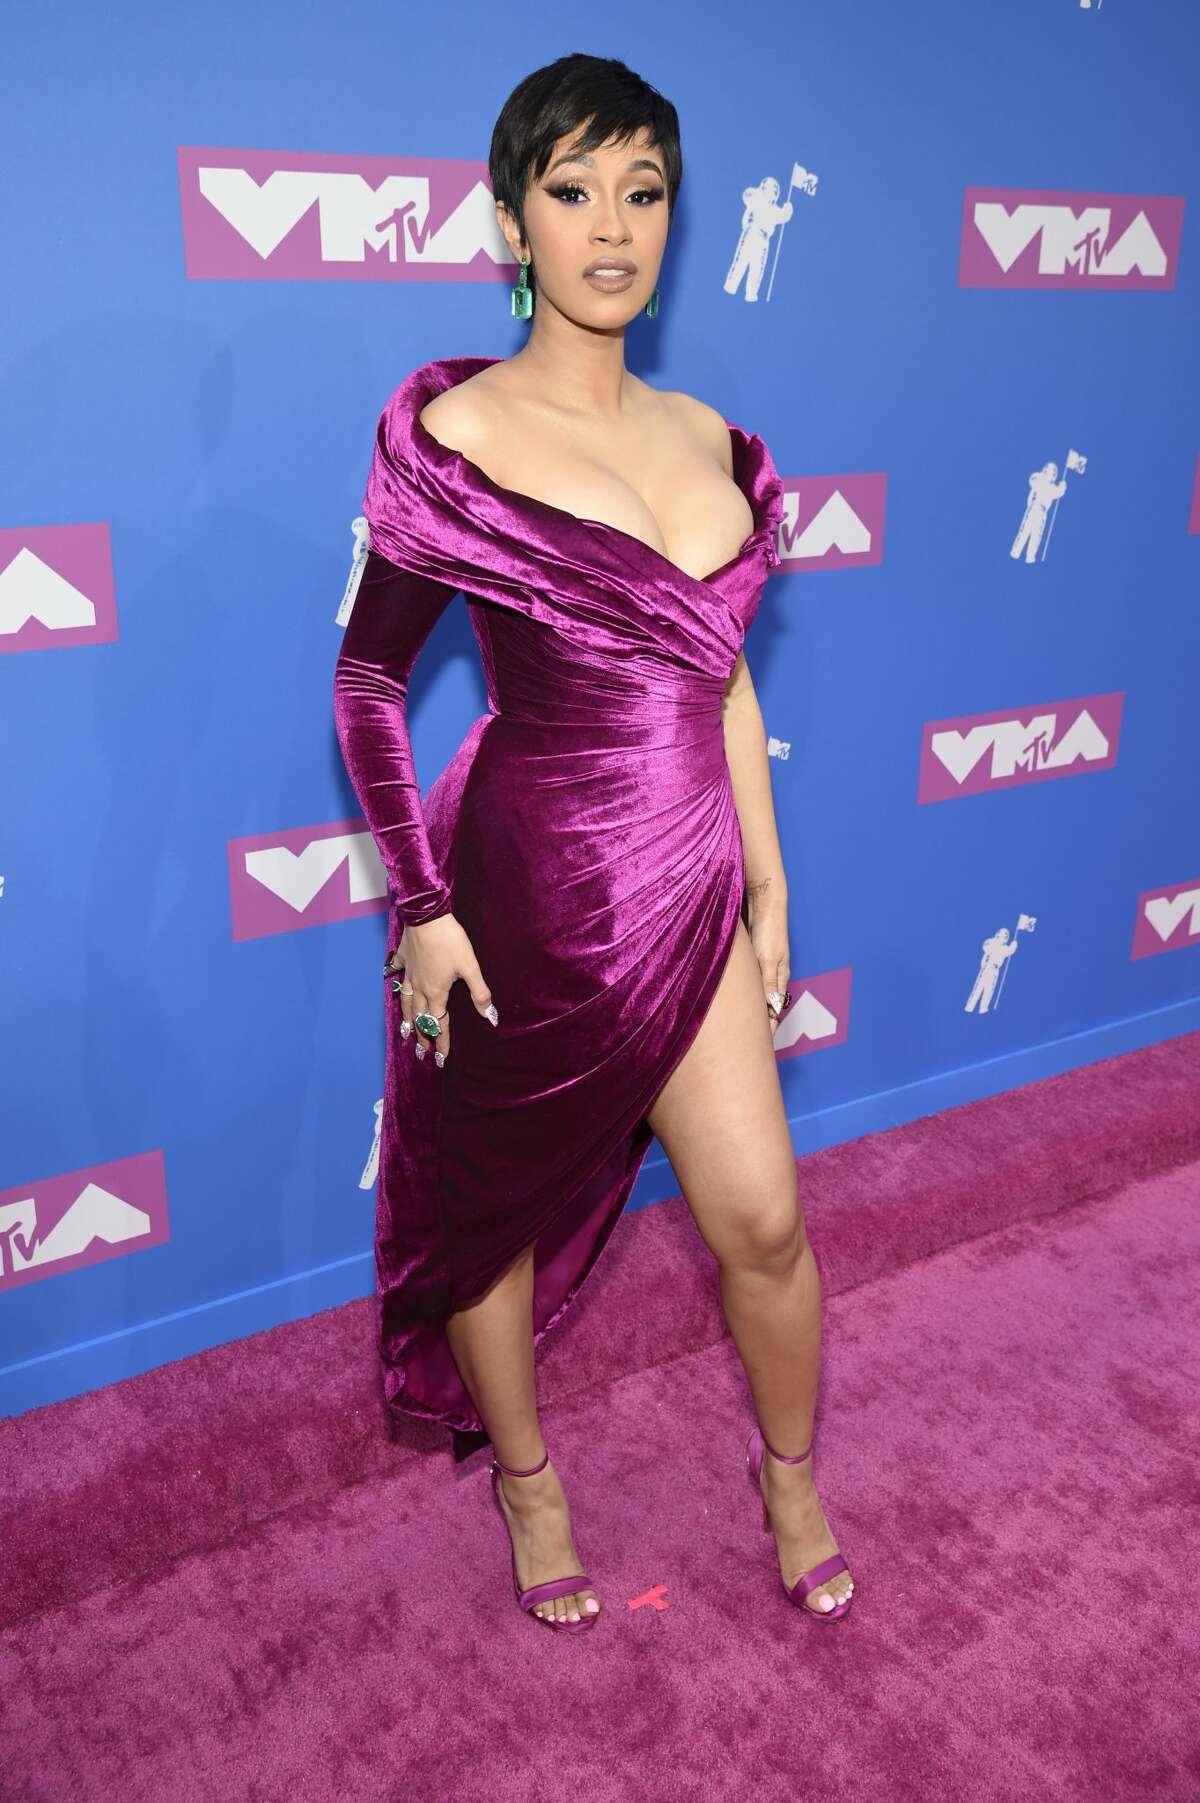 New mom Cardi B slayed in this royal purple dress.